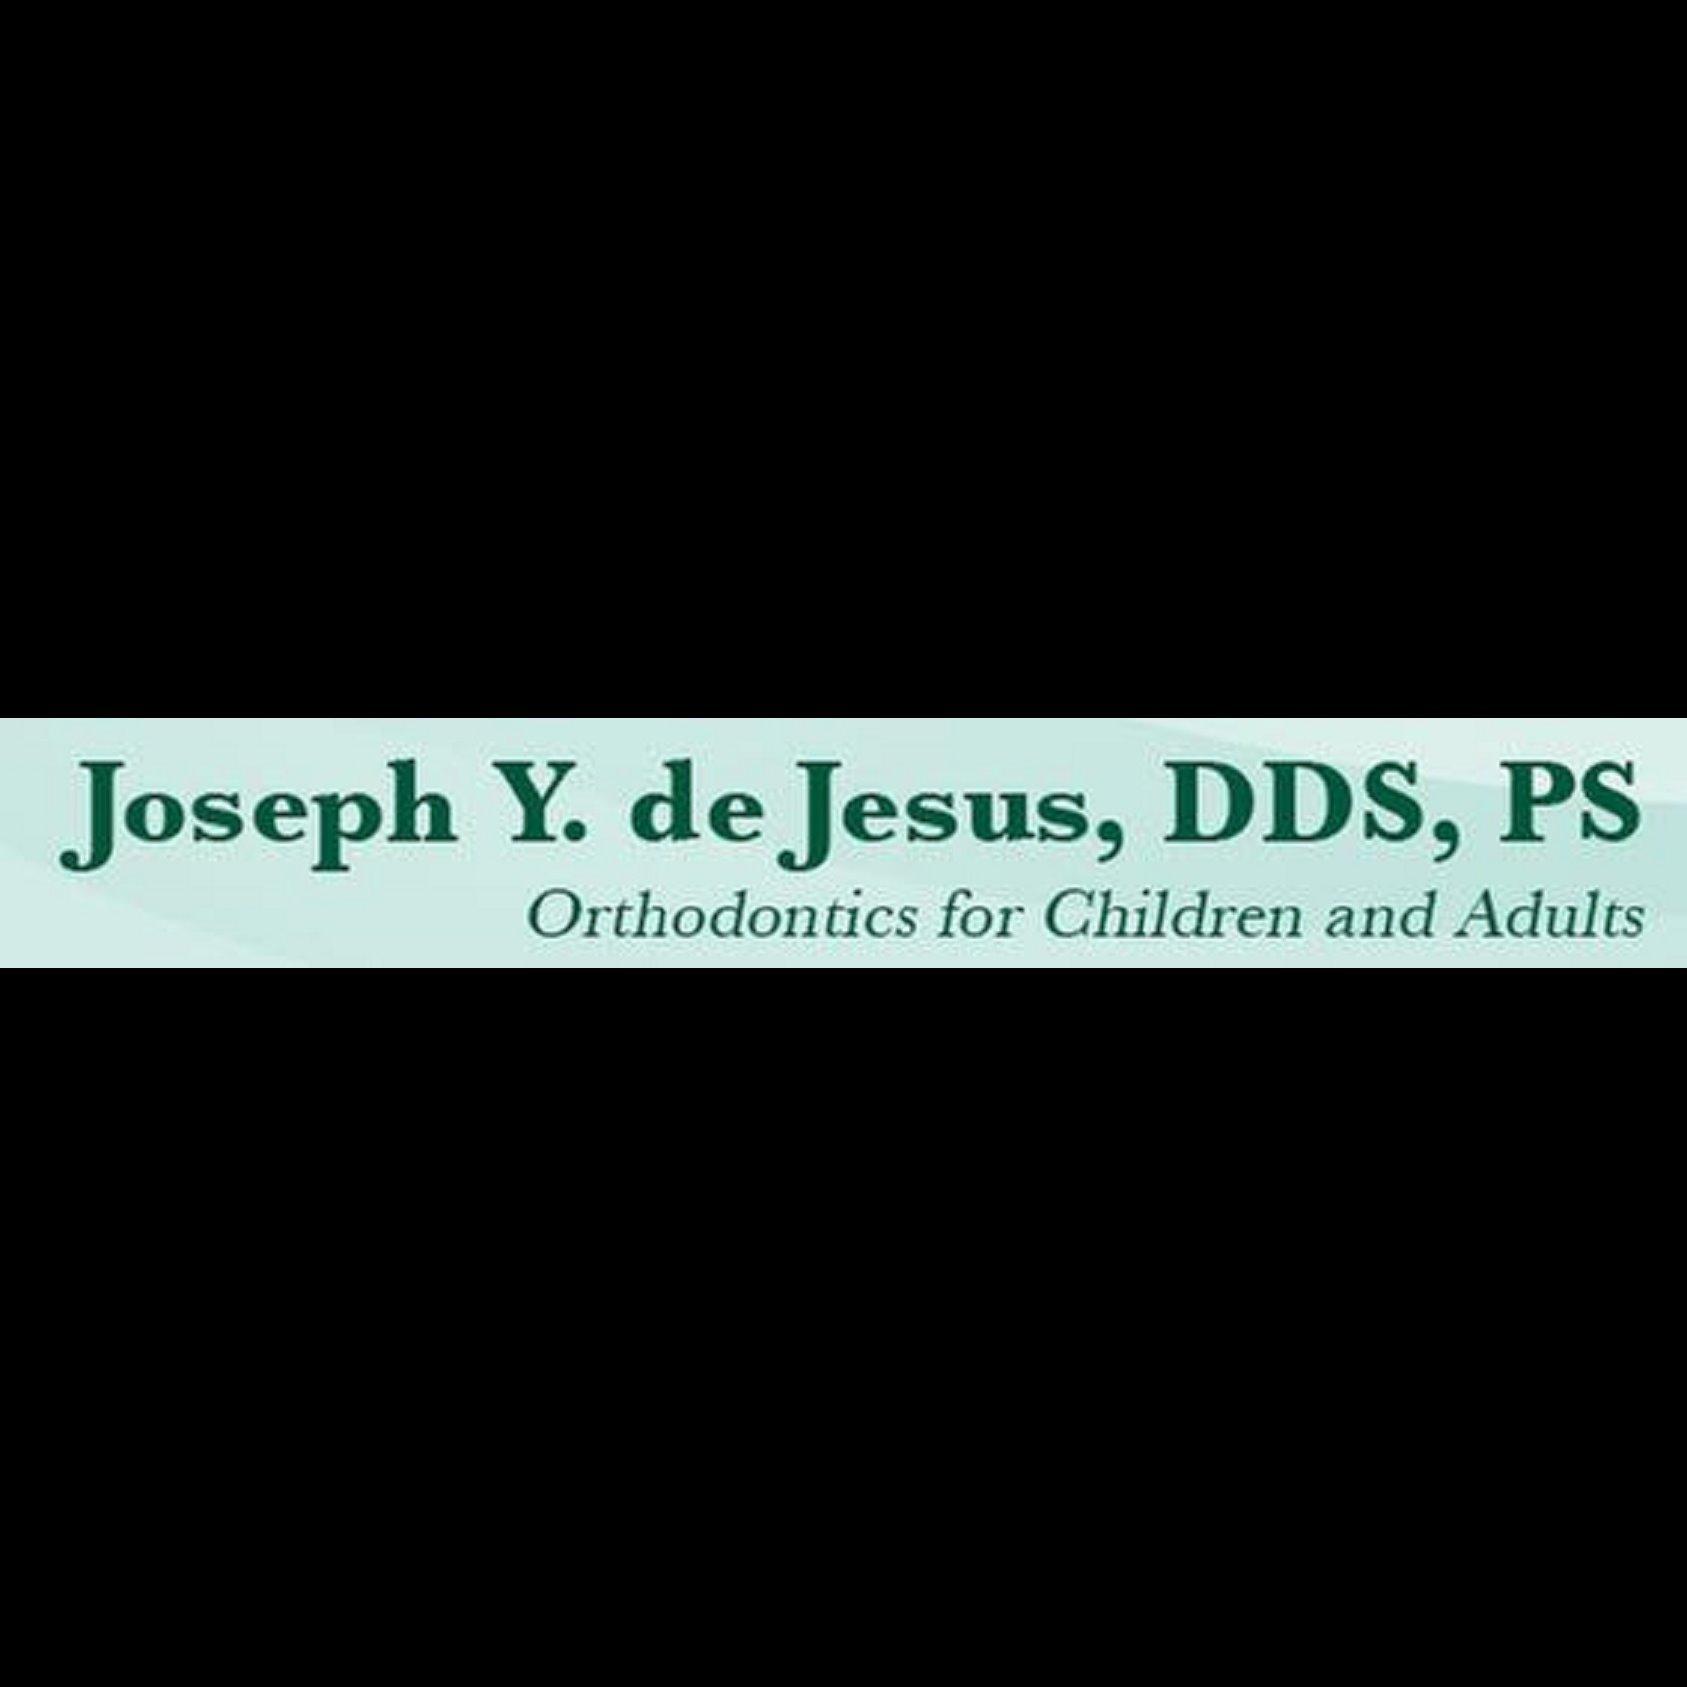 Joseph Y. de Jesus, DDS, PS